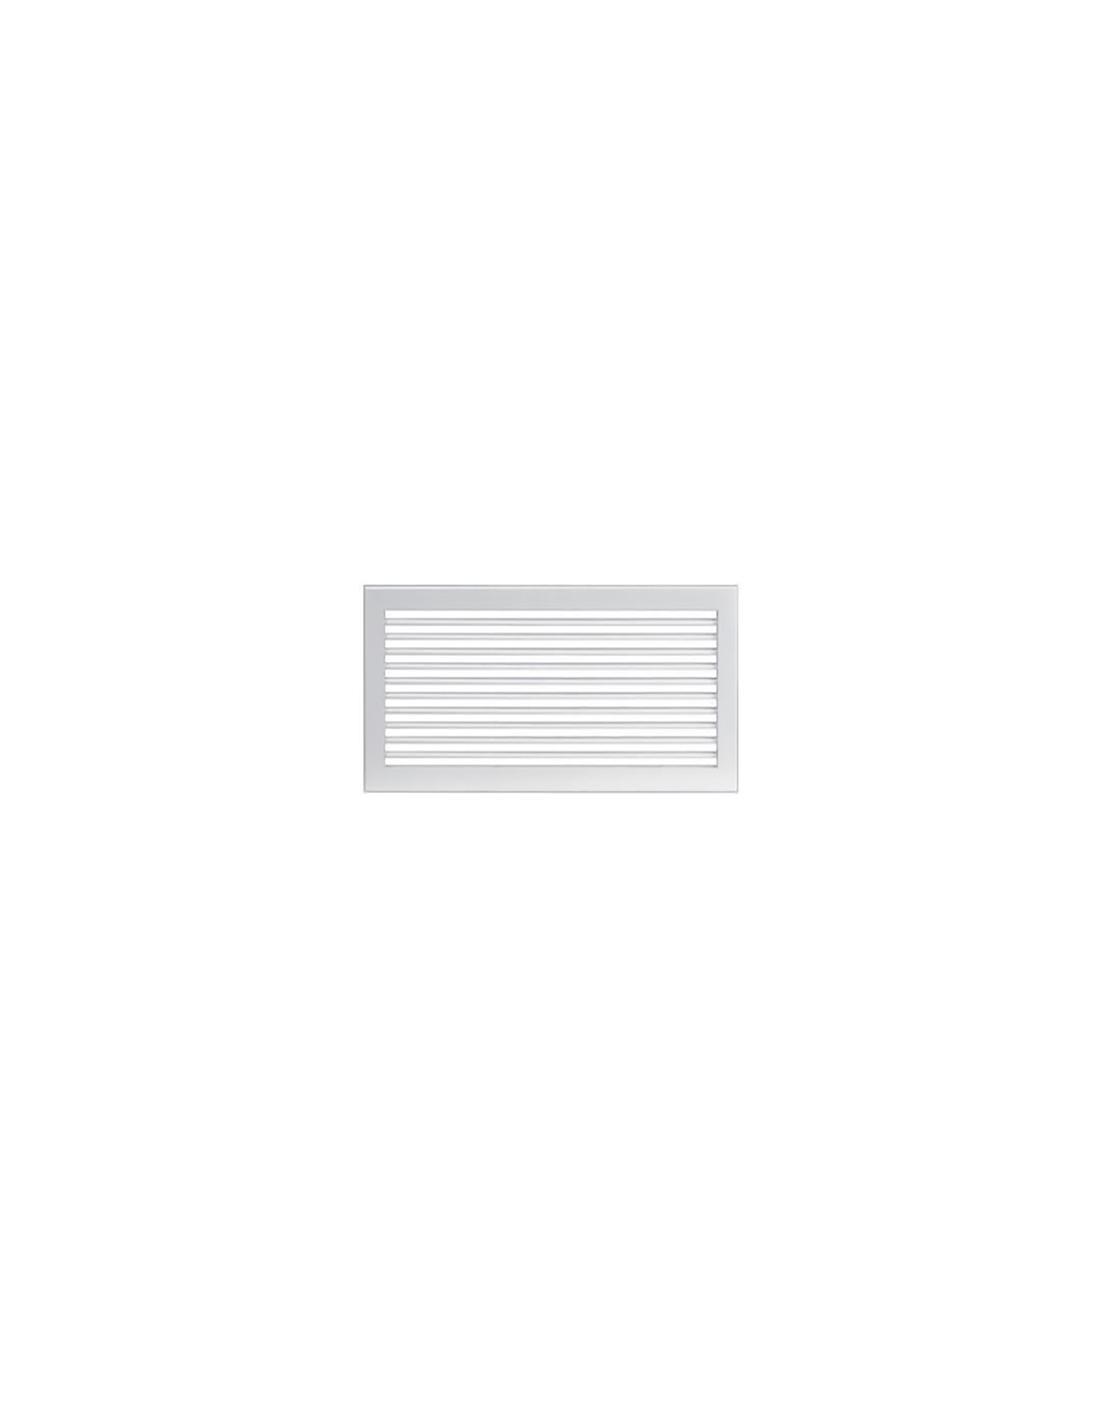 GRILLE SIMPLE de Ventilation - 1